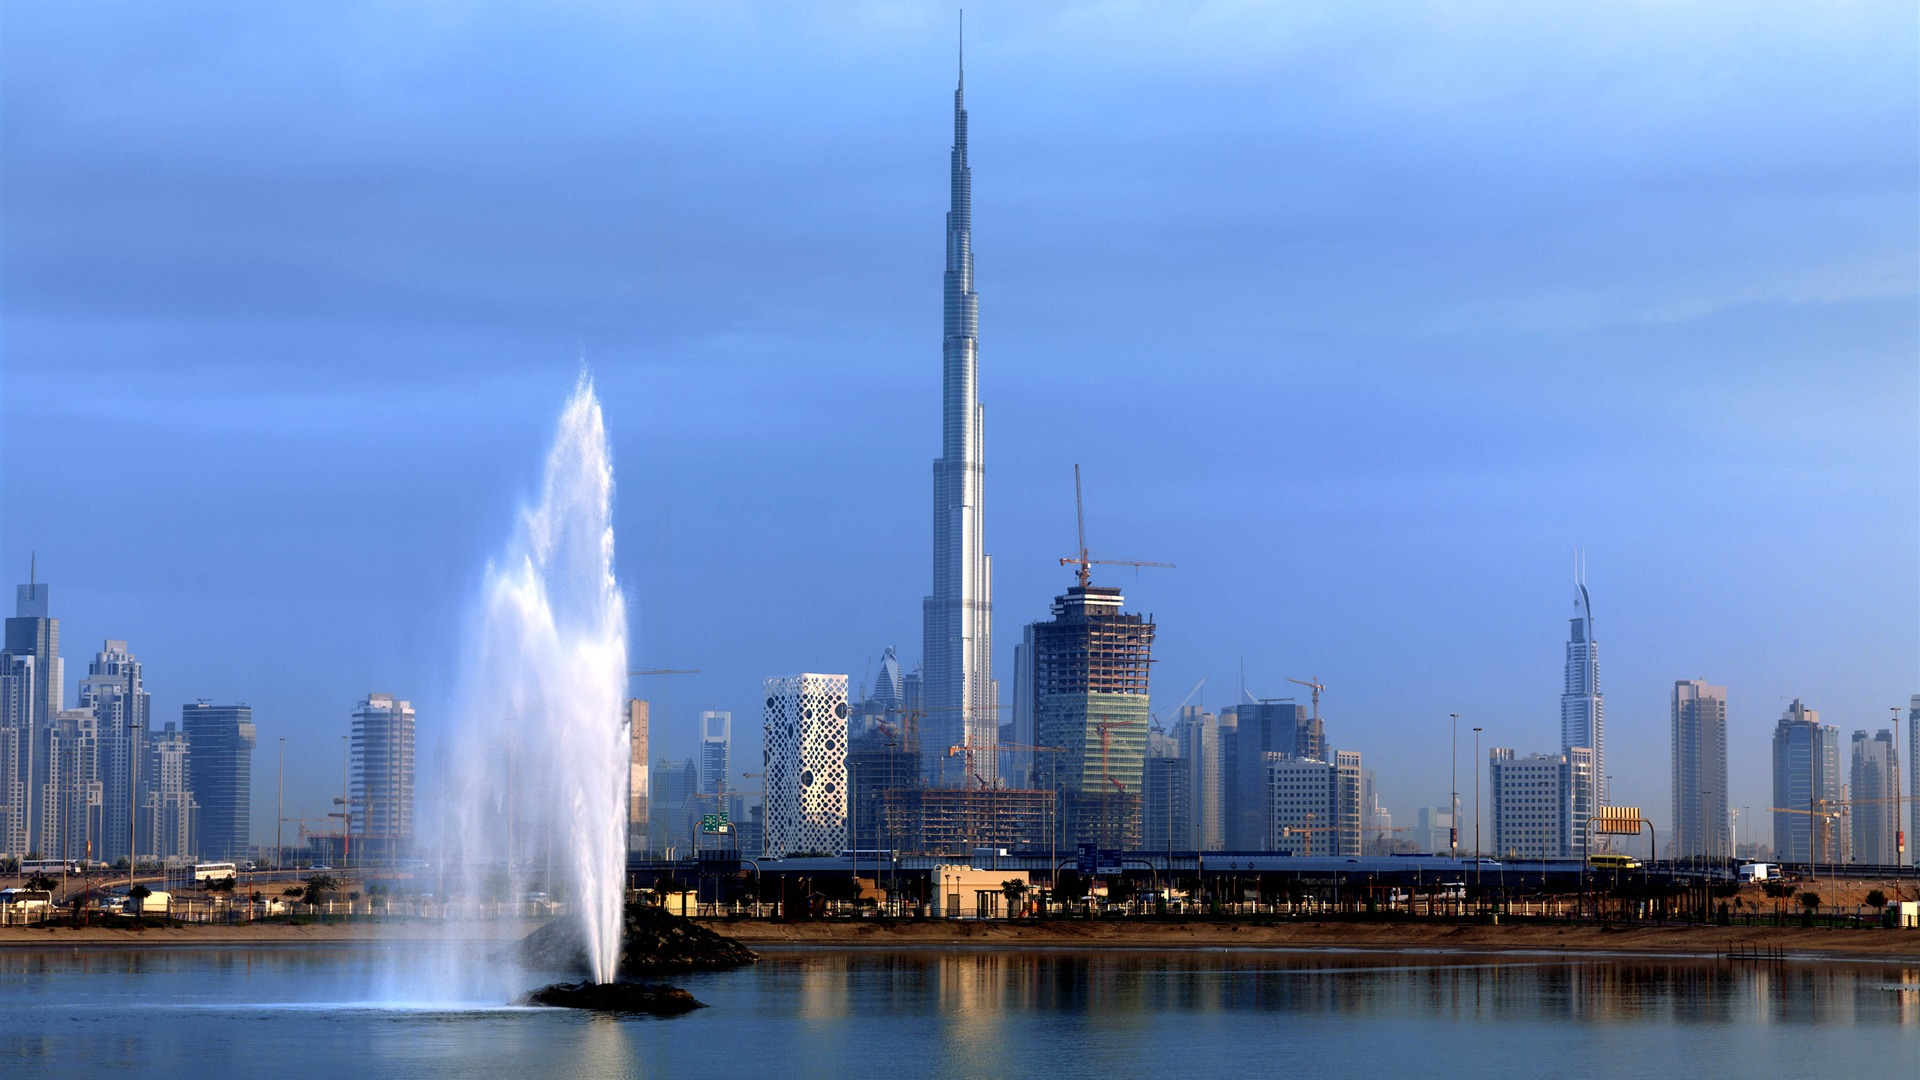 Burj Khalifa Wide Wallpaper   Travel HD Wallpapers 1920x1080